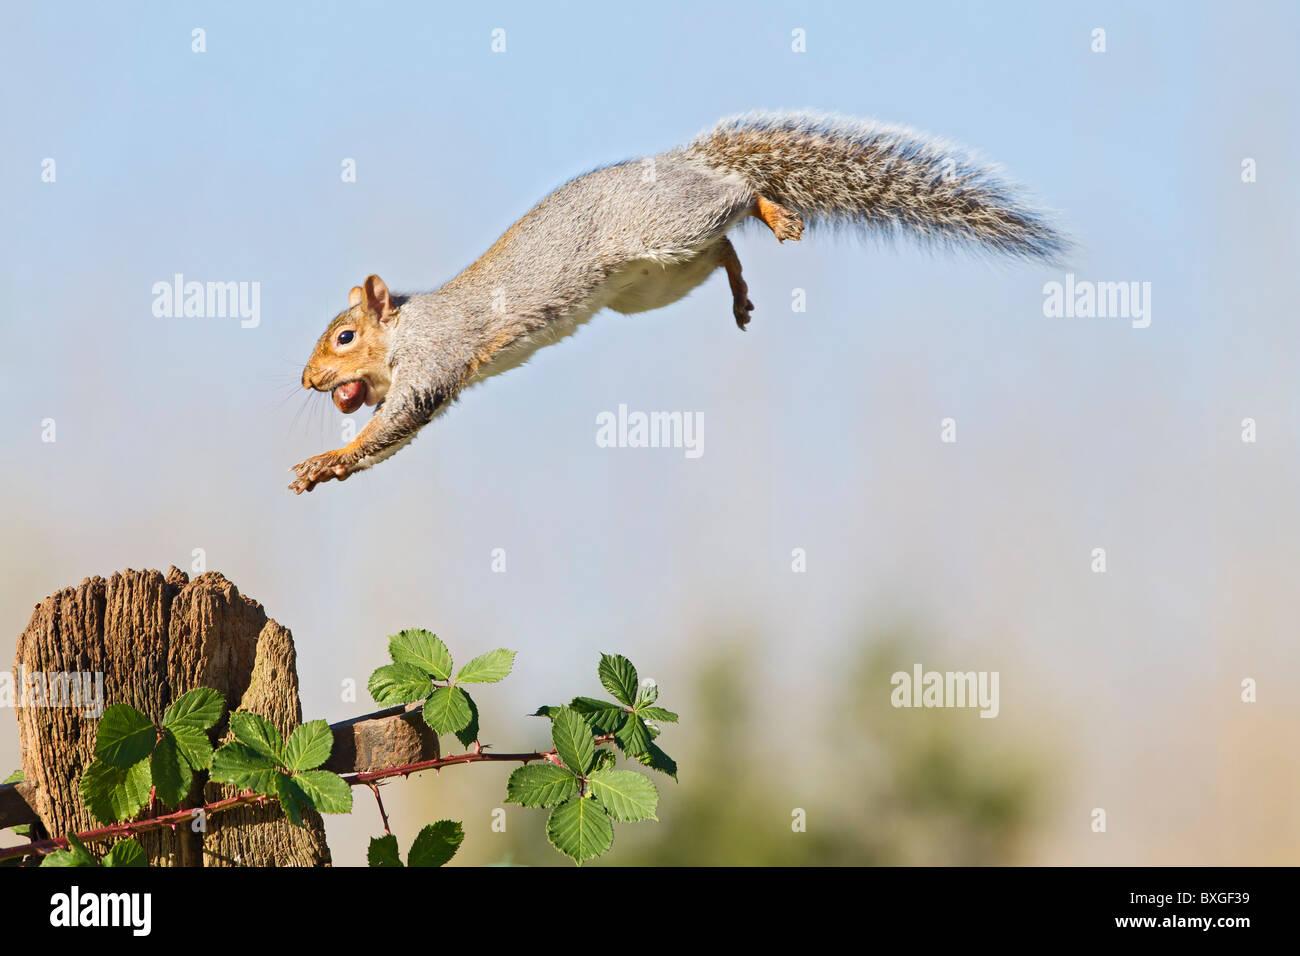 Grey Squirrel ( Sciurus carolinensis ) jumping to gate post - Stock Image